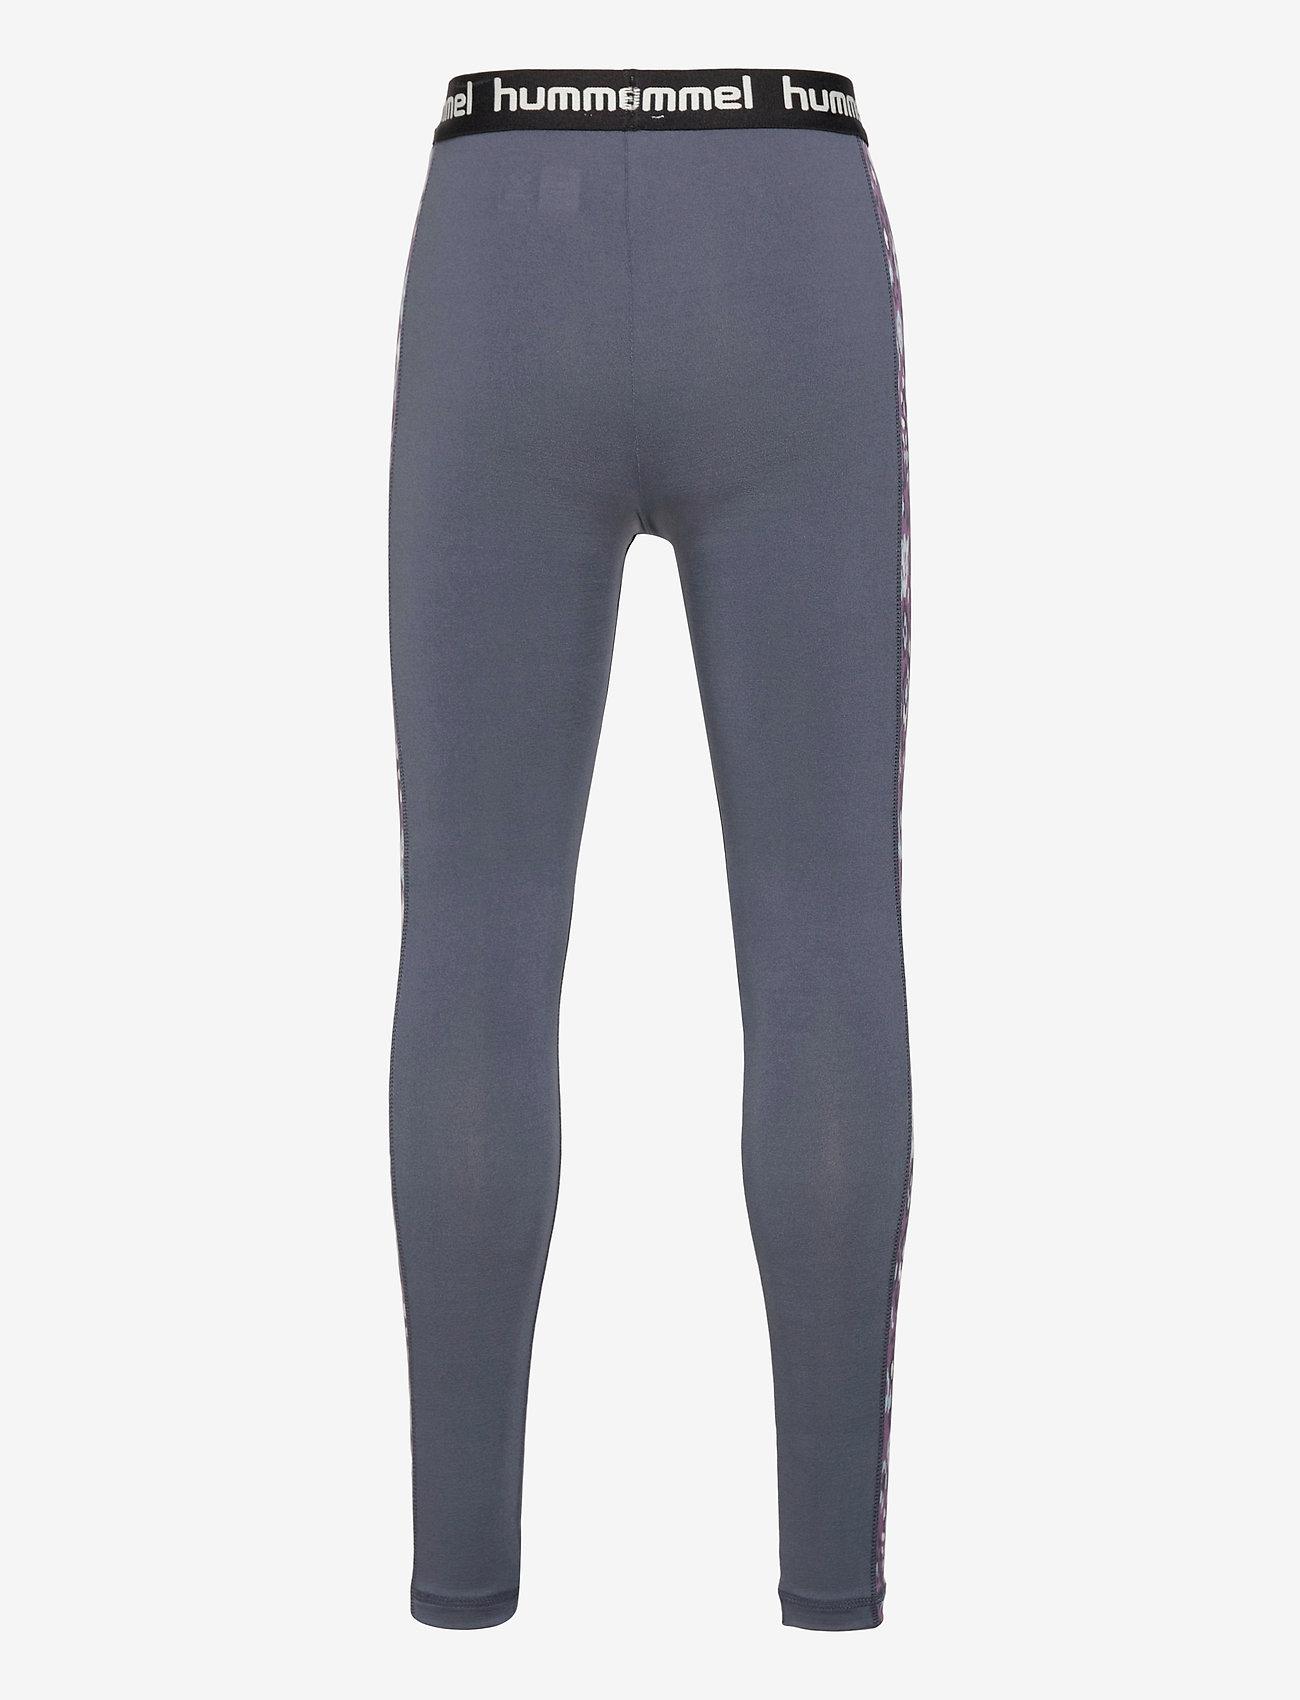 Hummel - hmlNANNA TIGHTS - leggings - ombre blue - 1